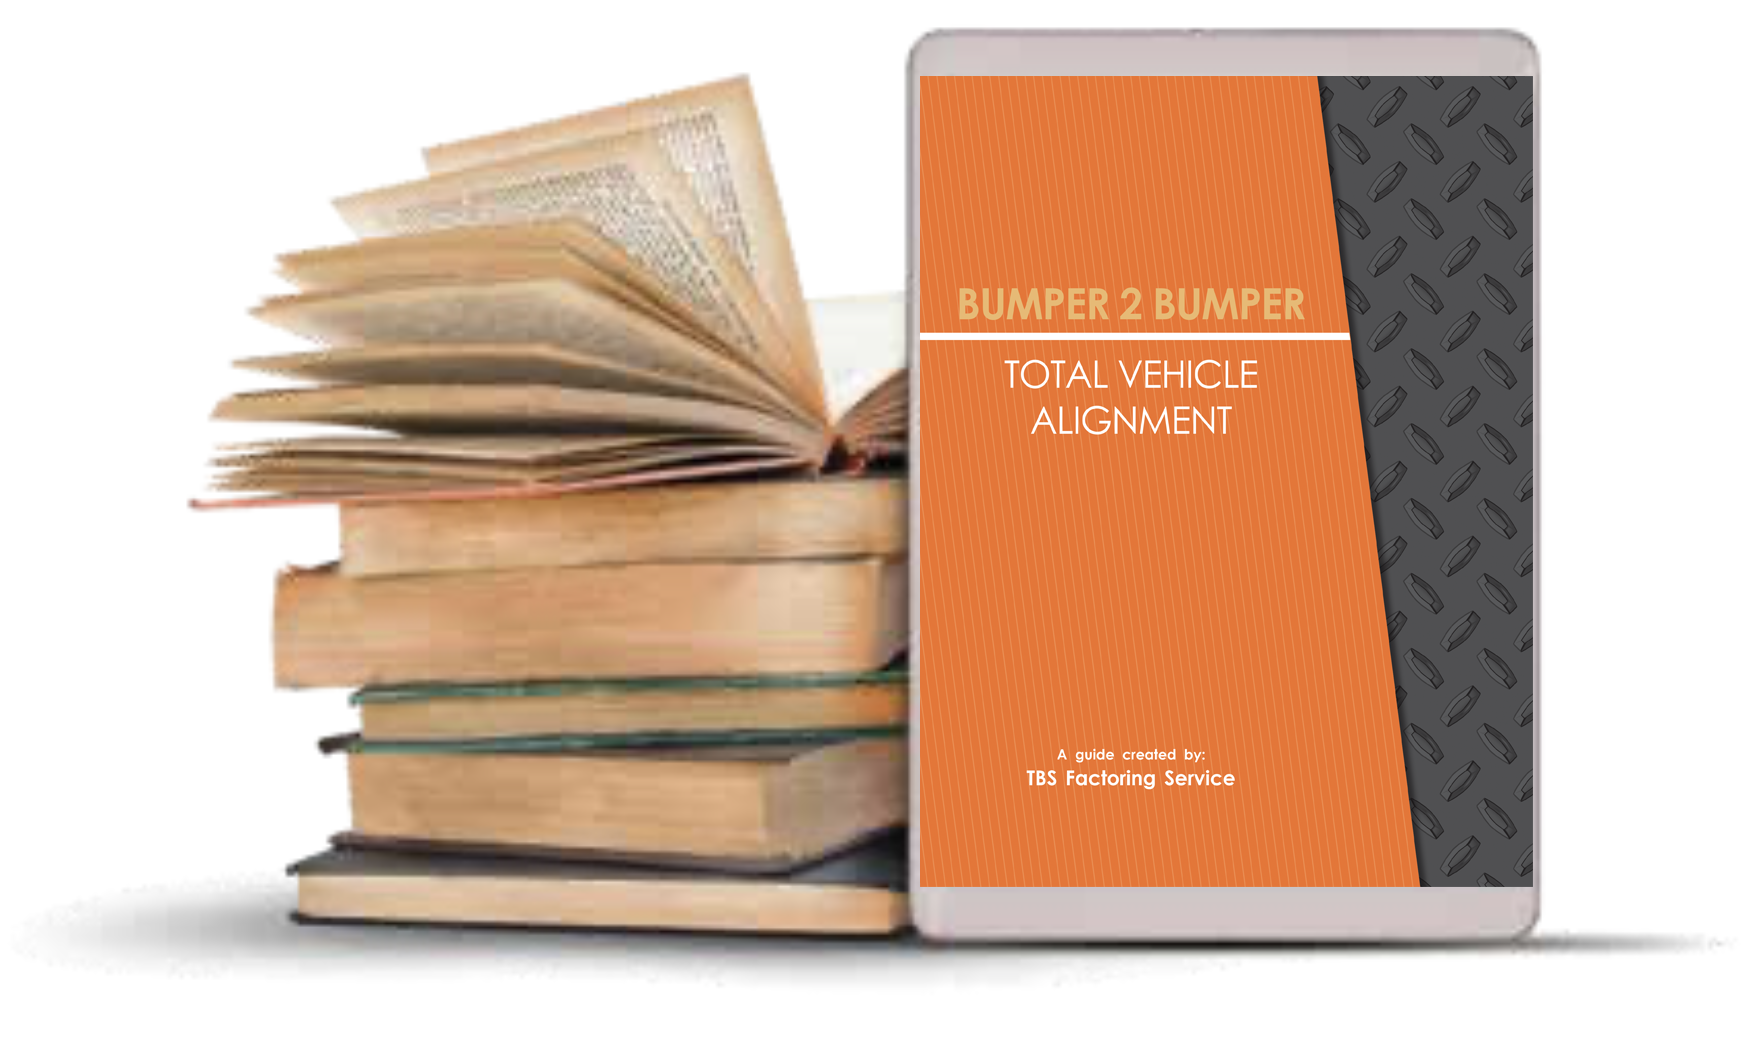 Bumper 2 Bumper Total Vehicle Alignment E-Book